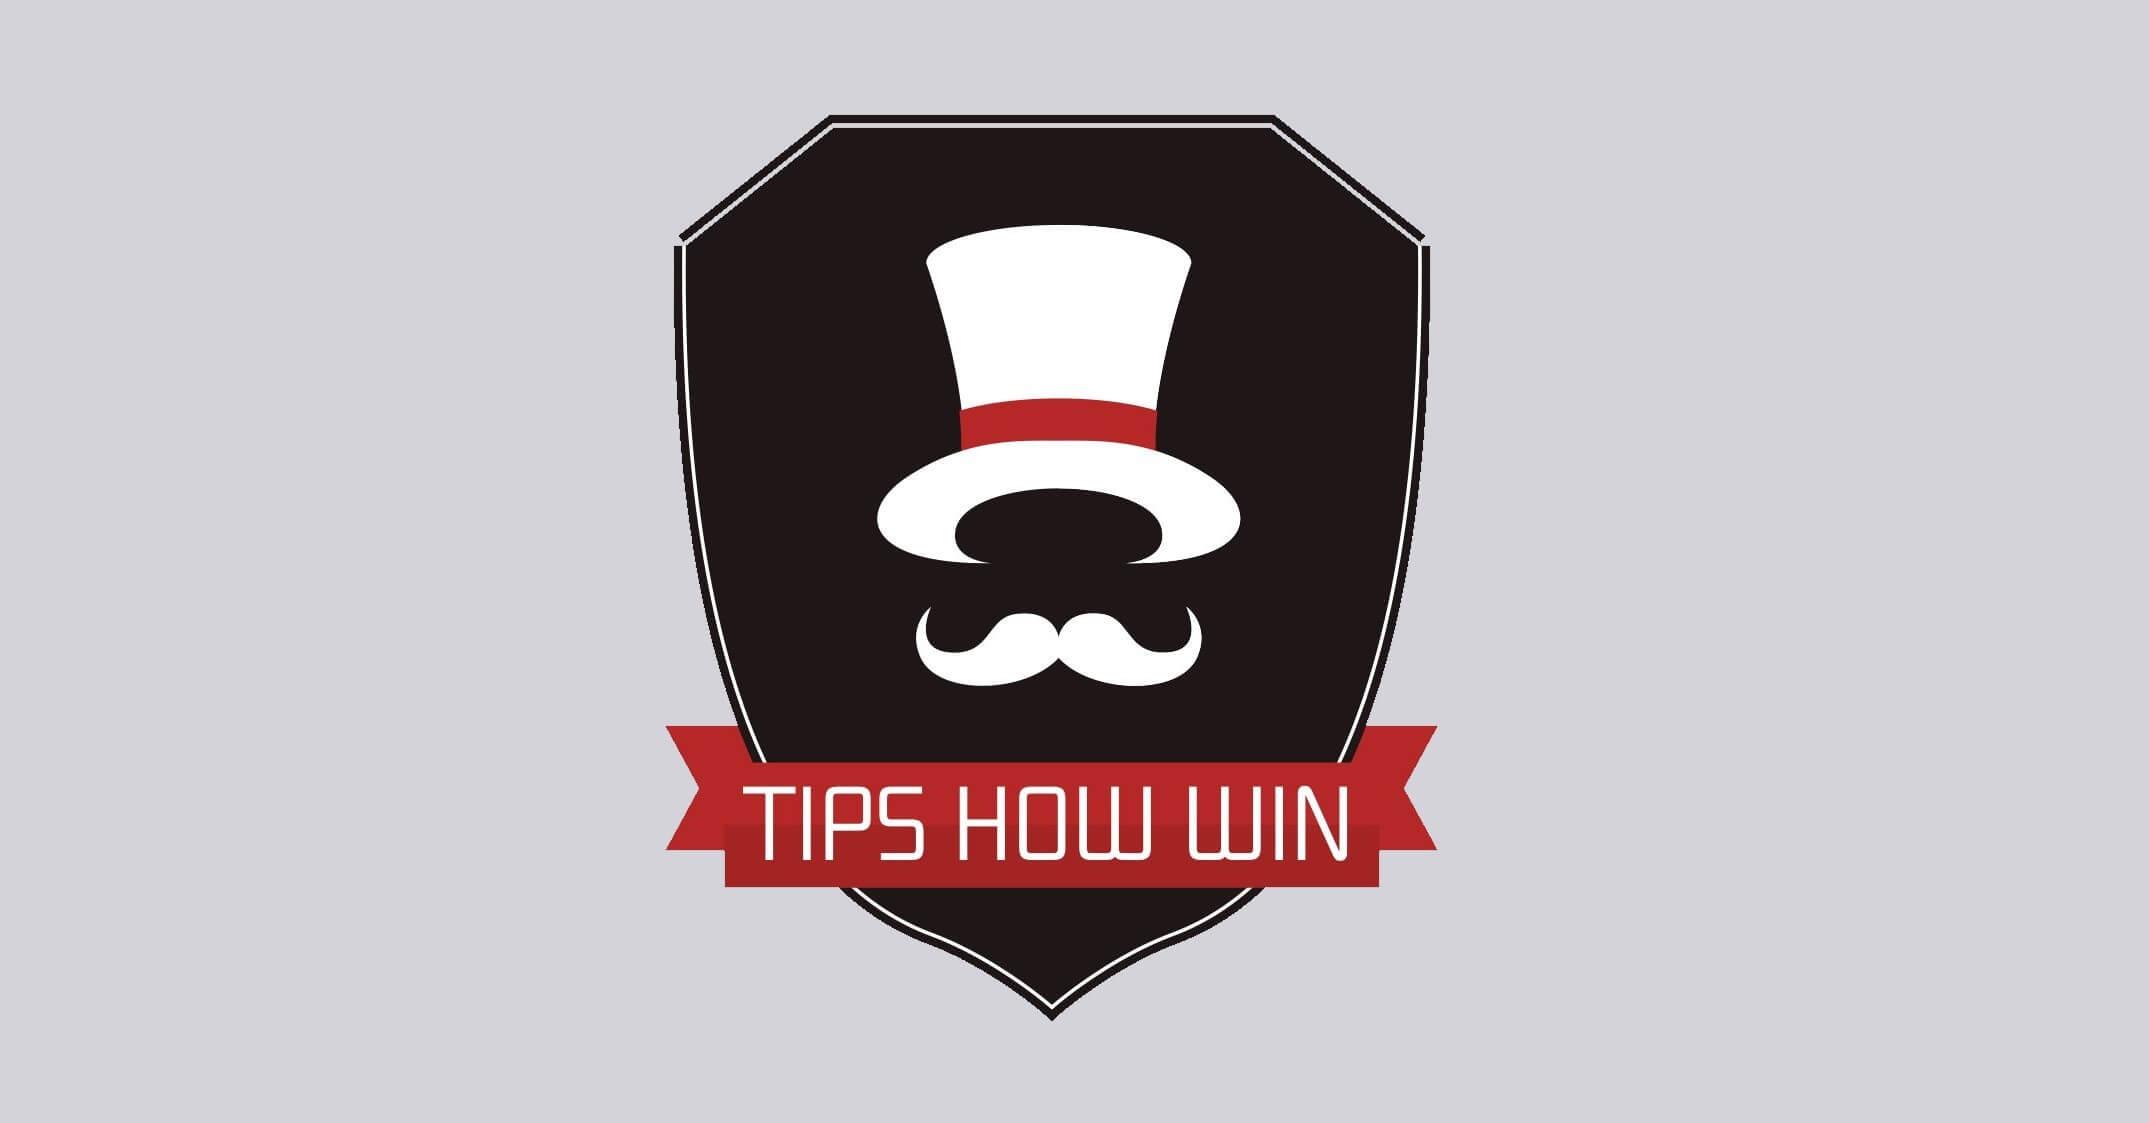 TIPS HOW WIN